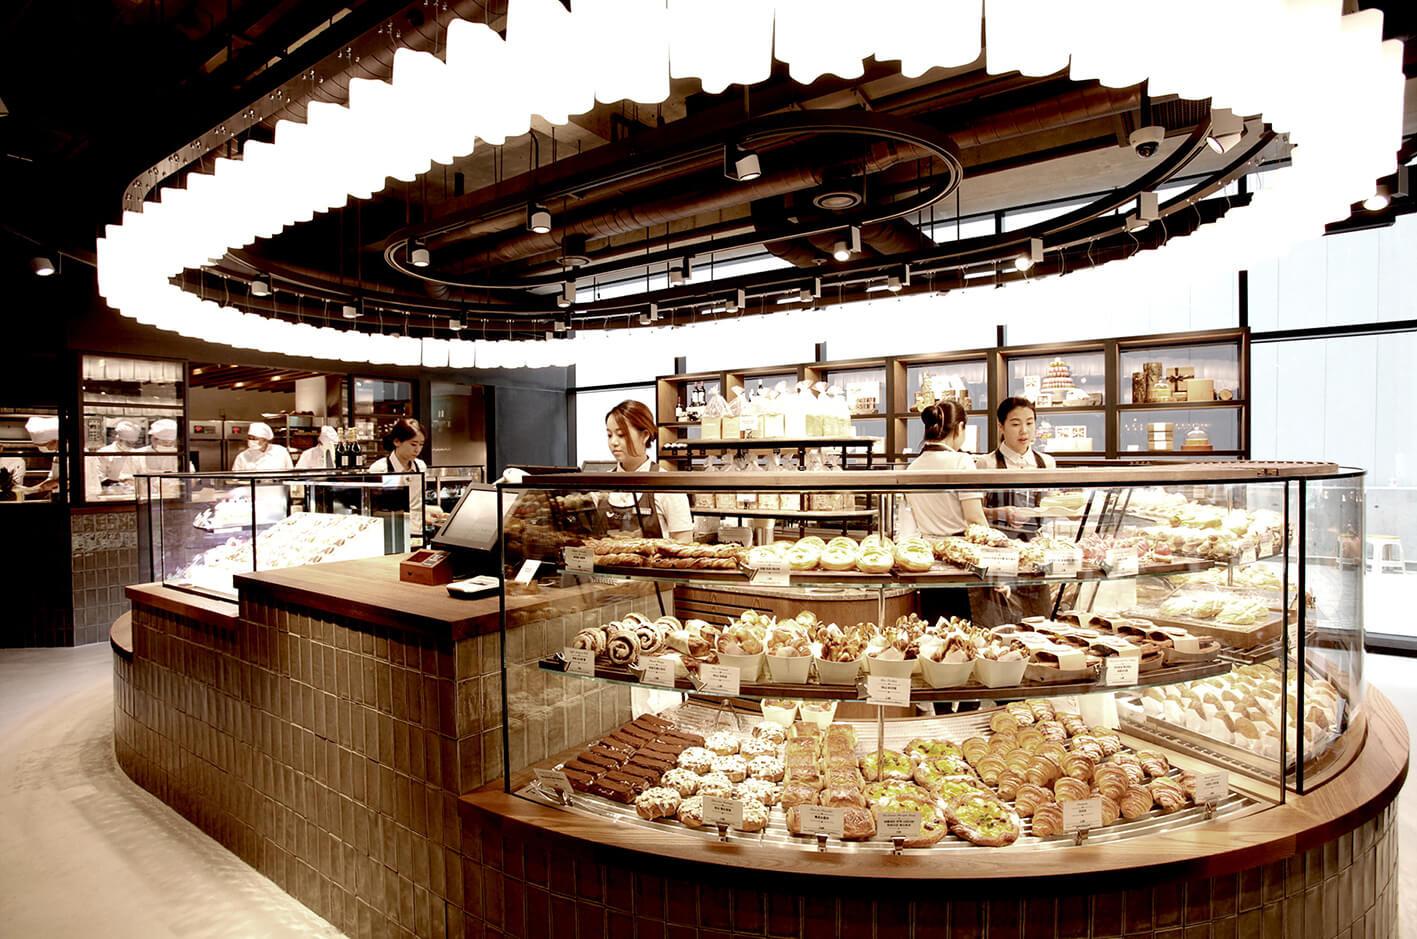 Spc Counter bakery.jpg